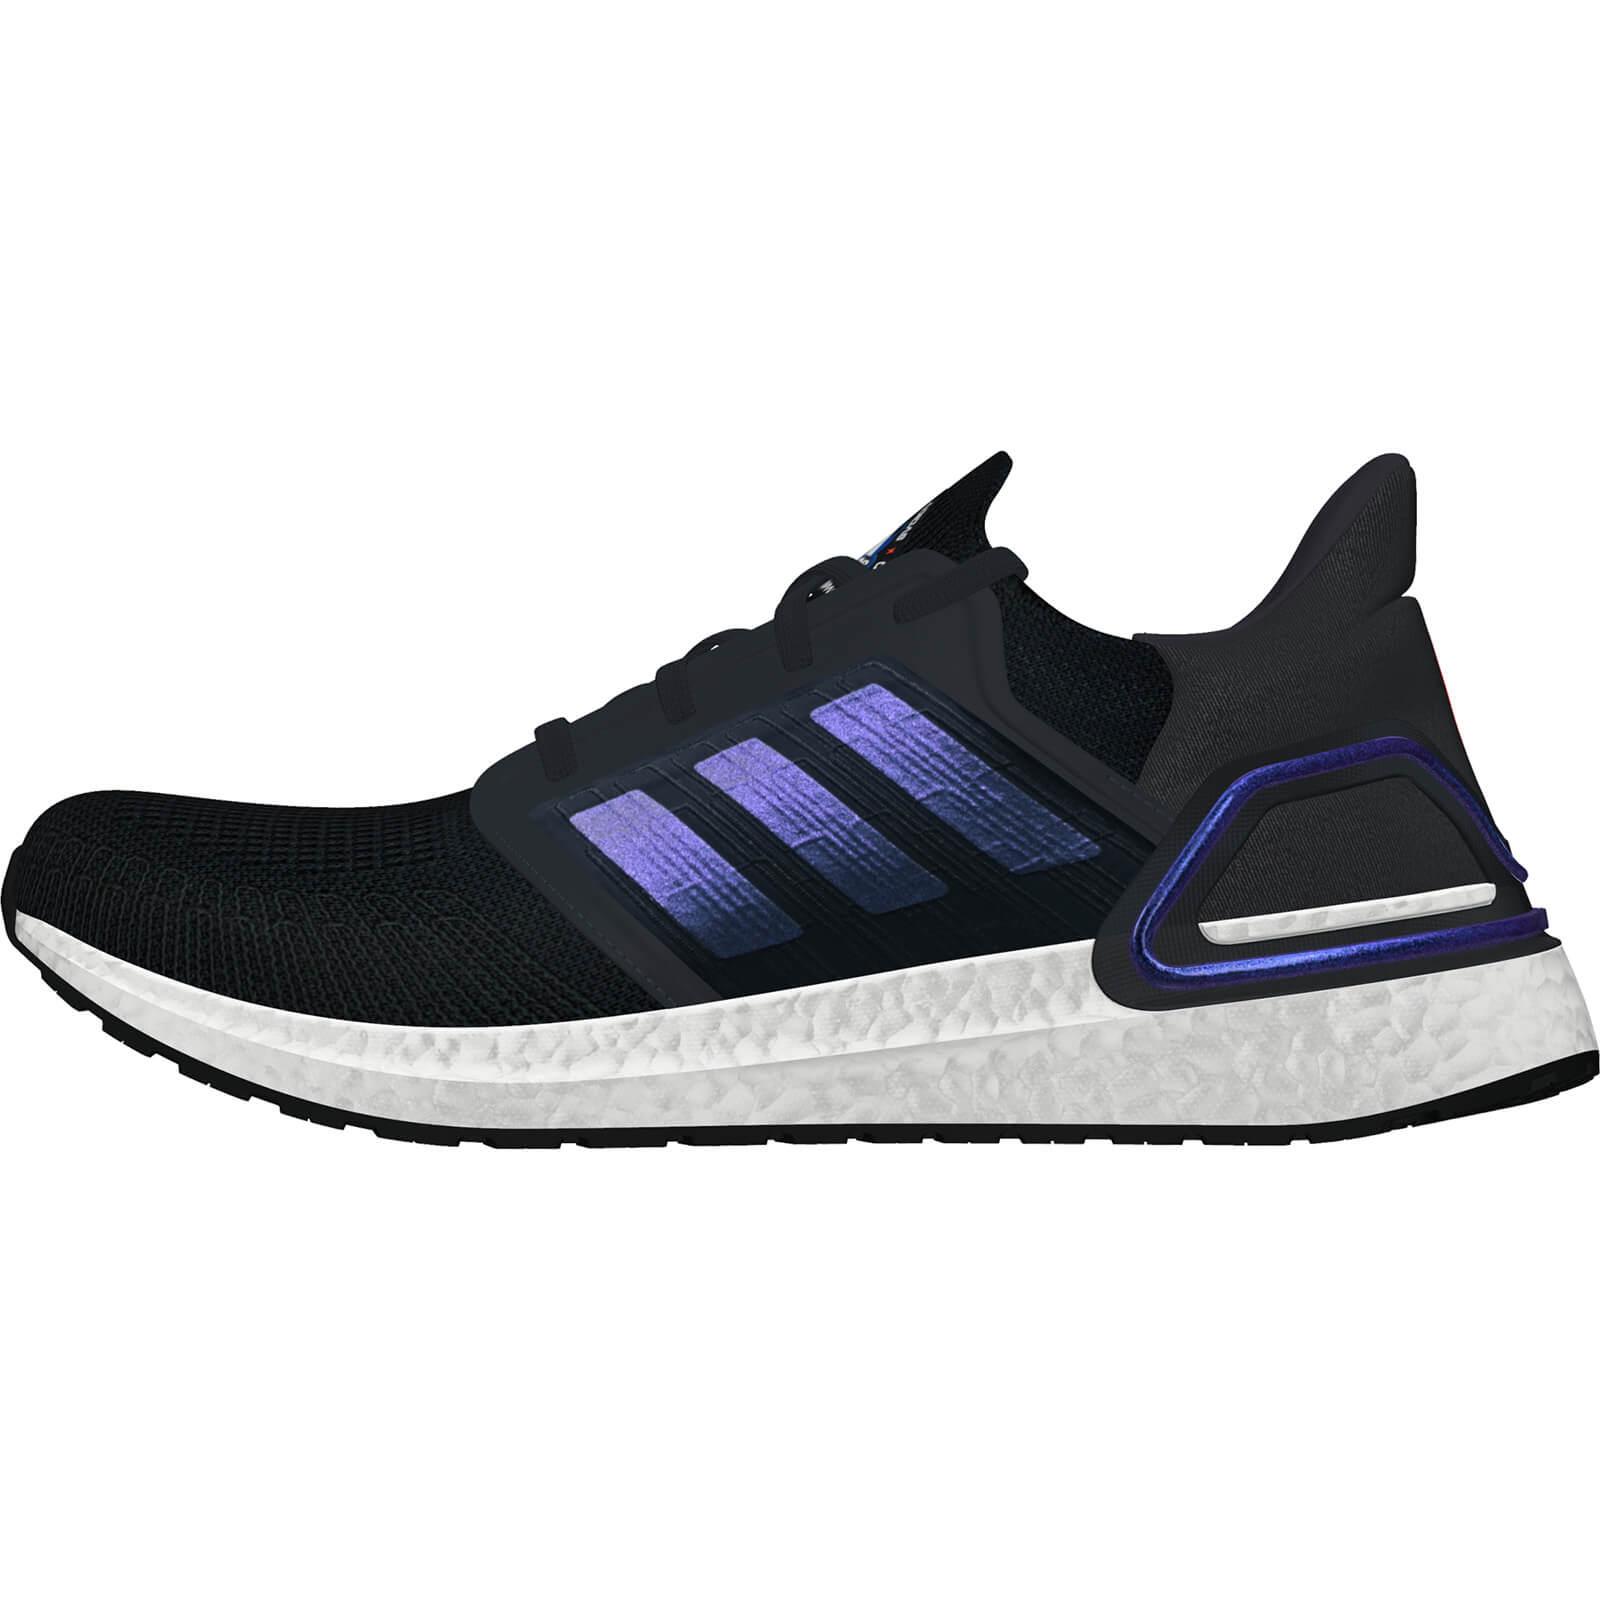 adidas Men's Ultraboost 20 Running Shoes £118.99 delivered @ ProBikeKit